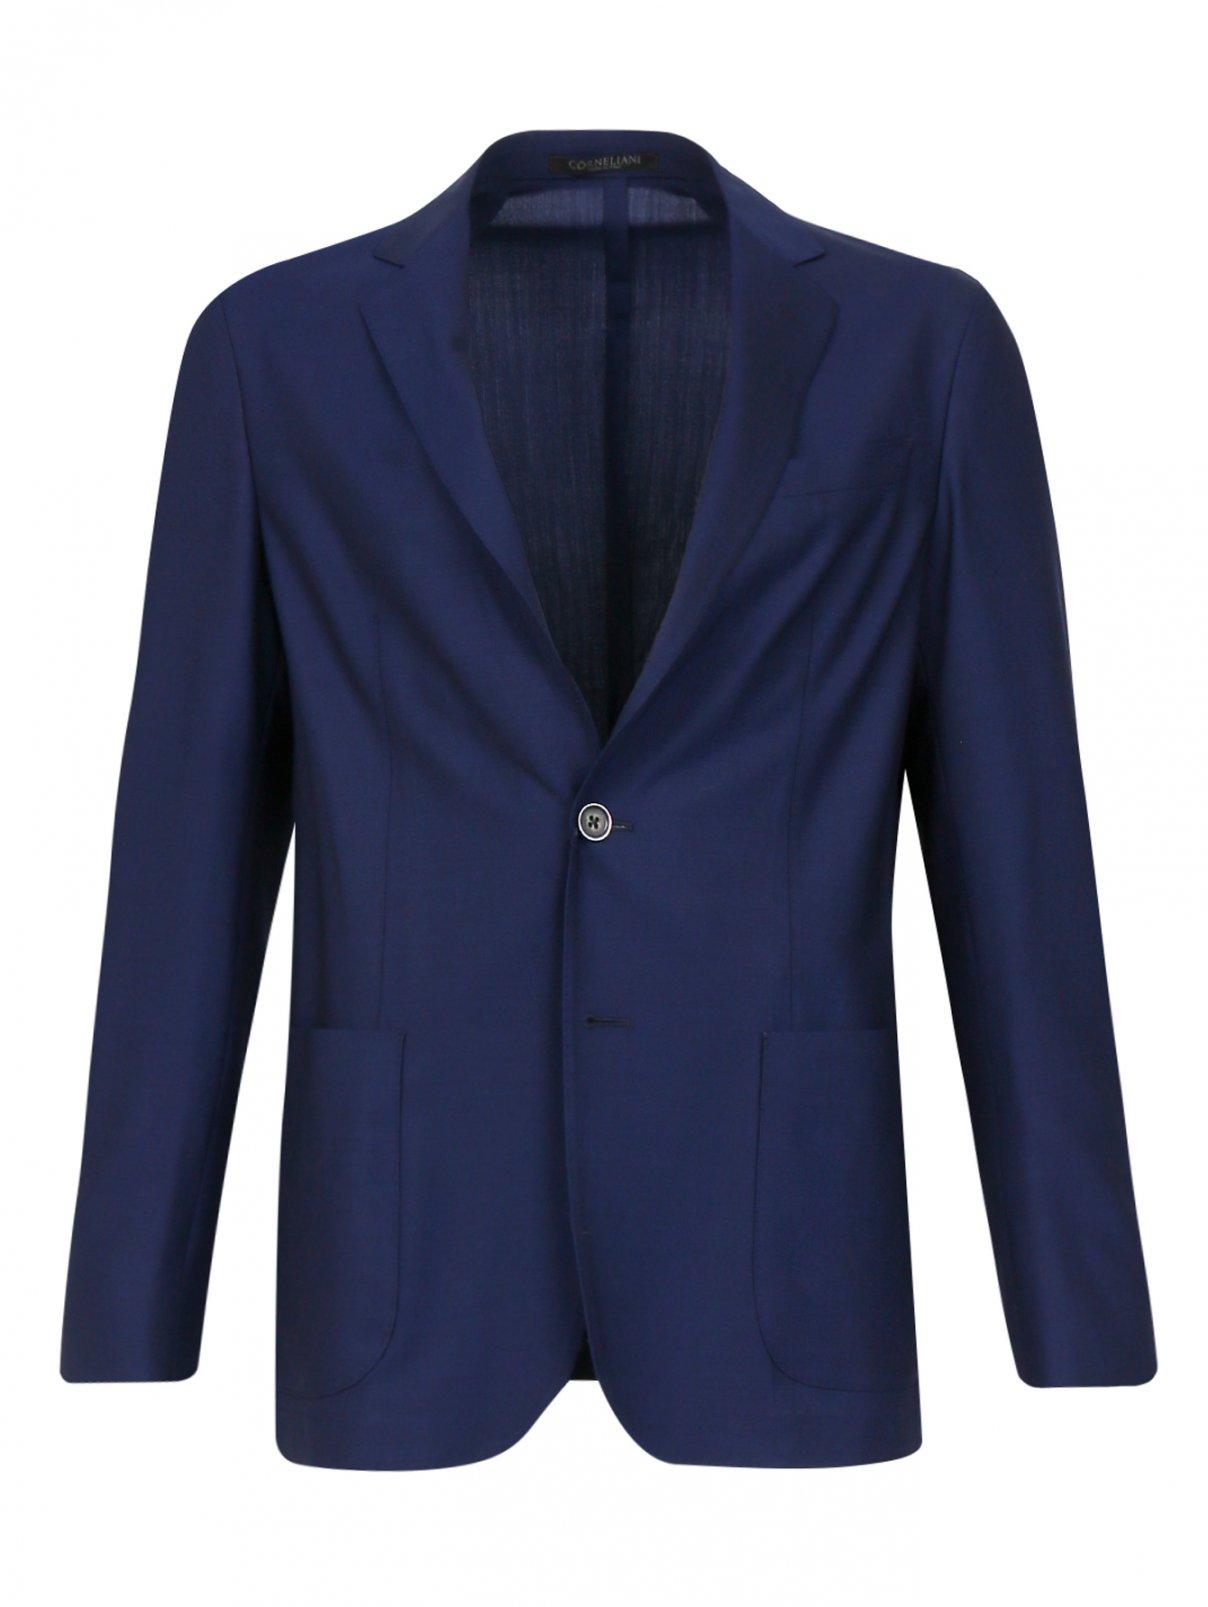 Пиджак из тонкой шерсти Corneliani ID  –  Общий вид  – Цвет:  Синий